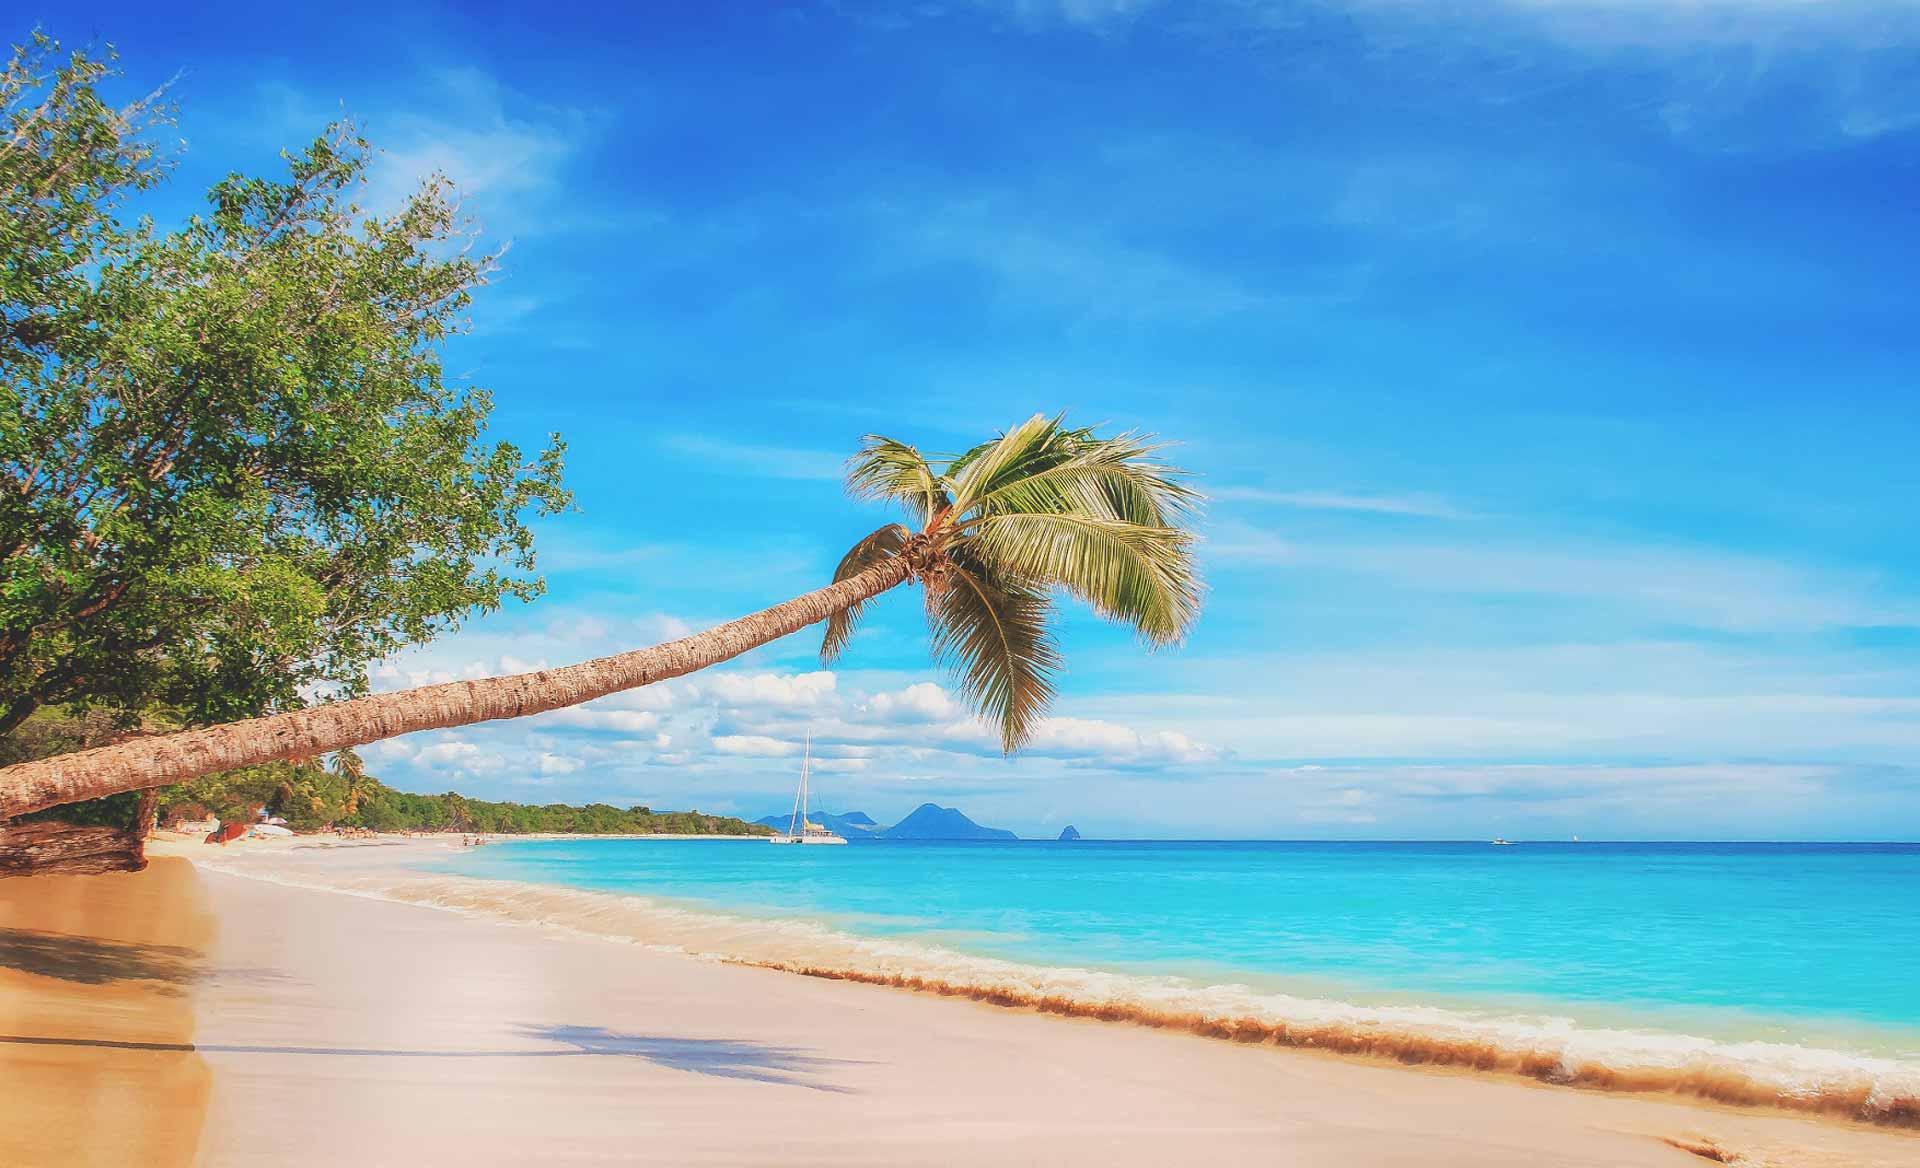 Pearl King Travel - Carribean